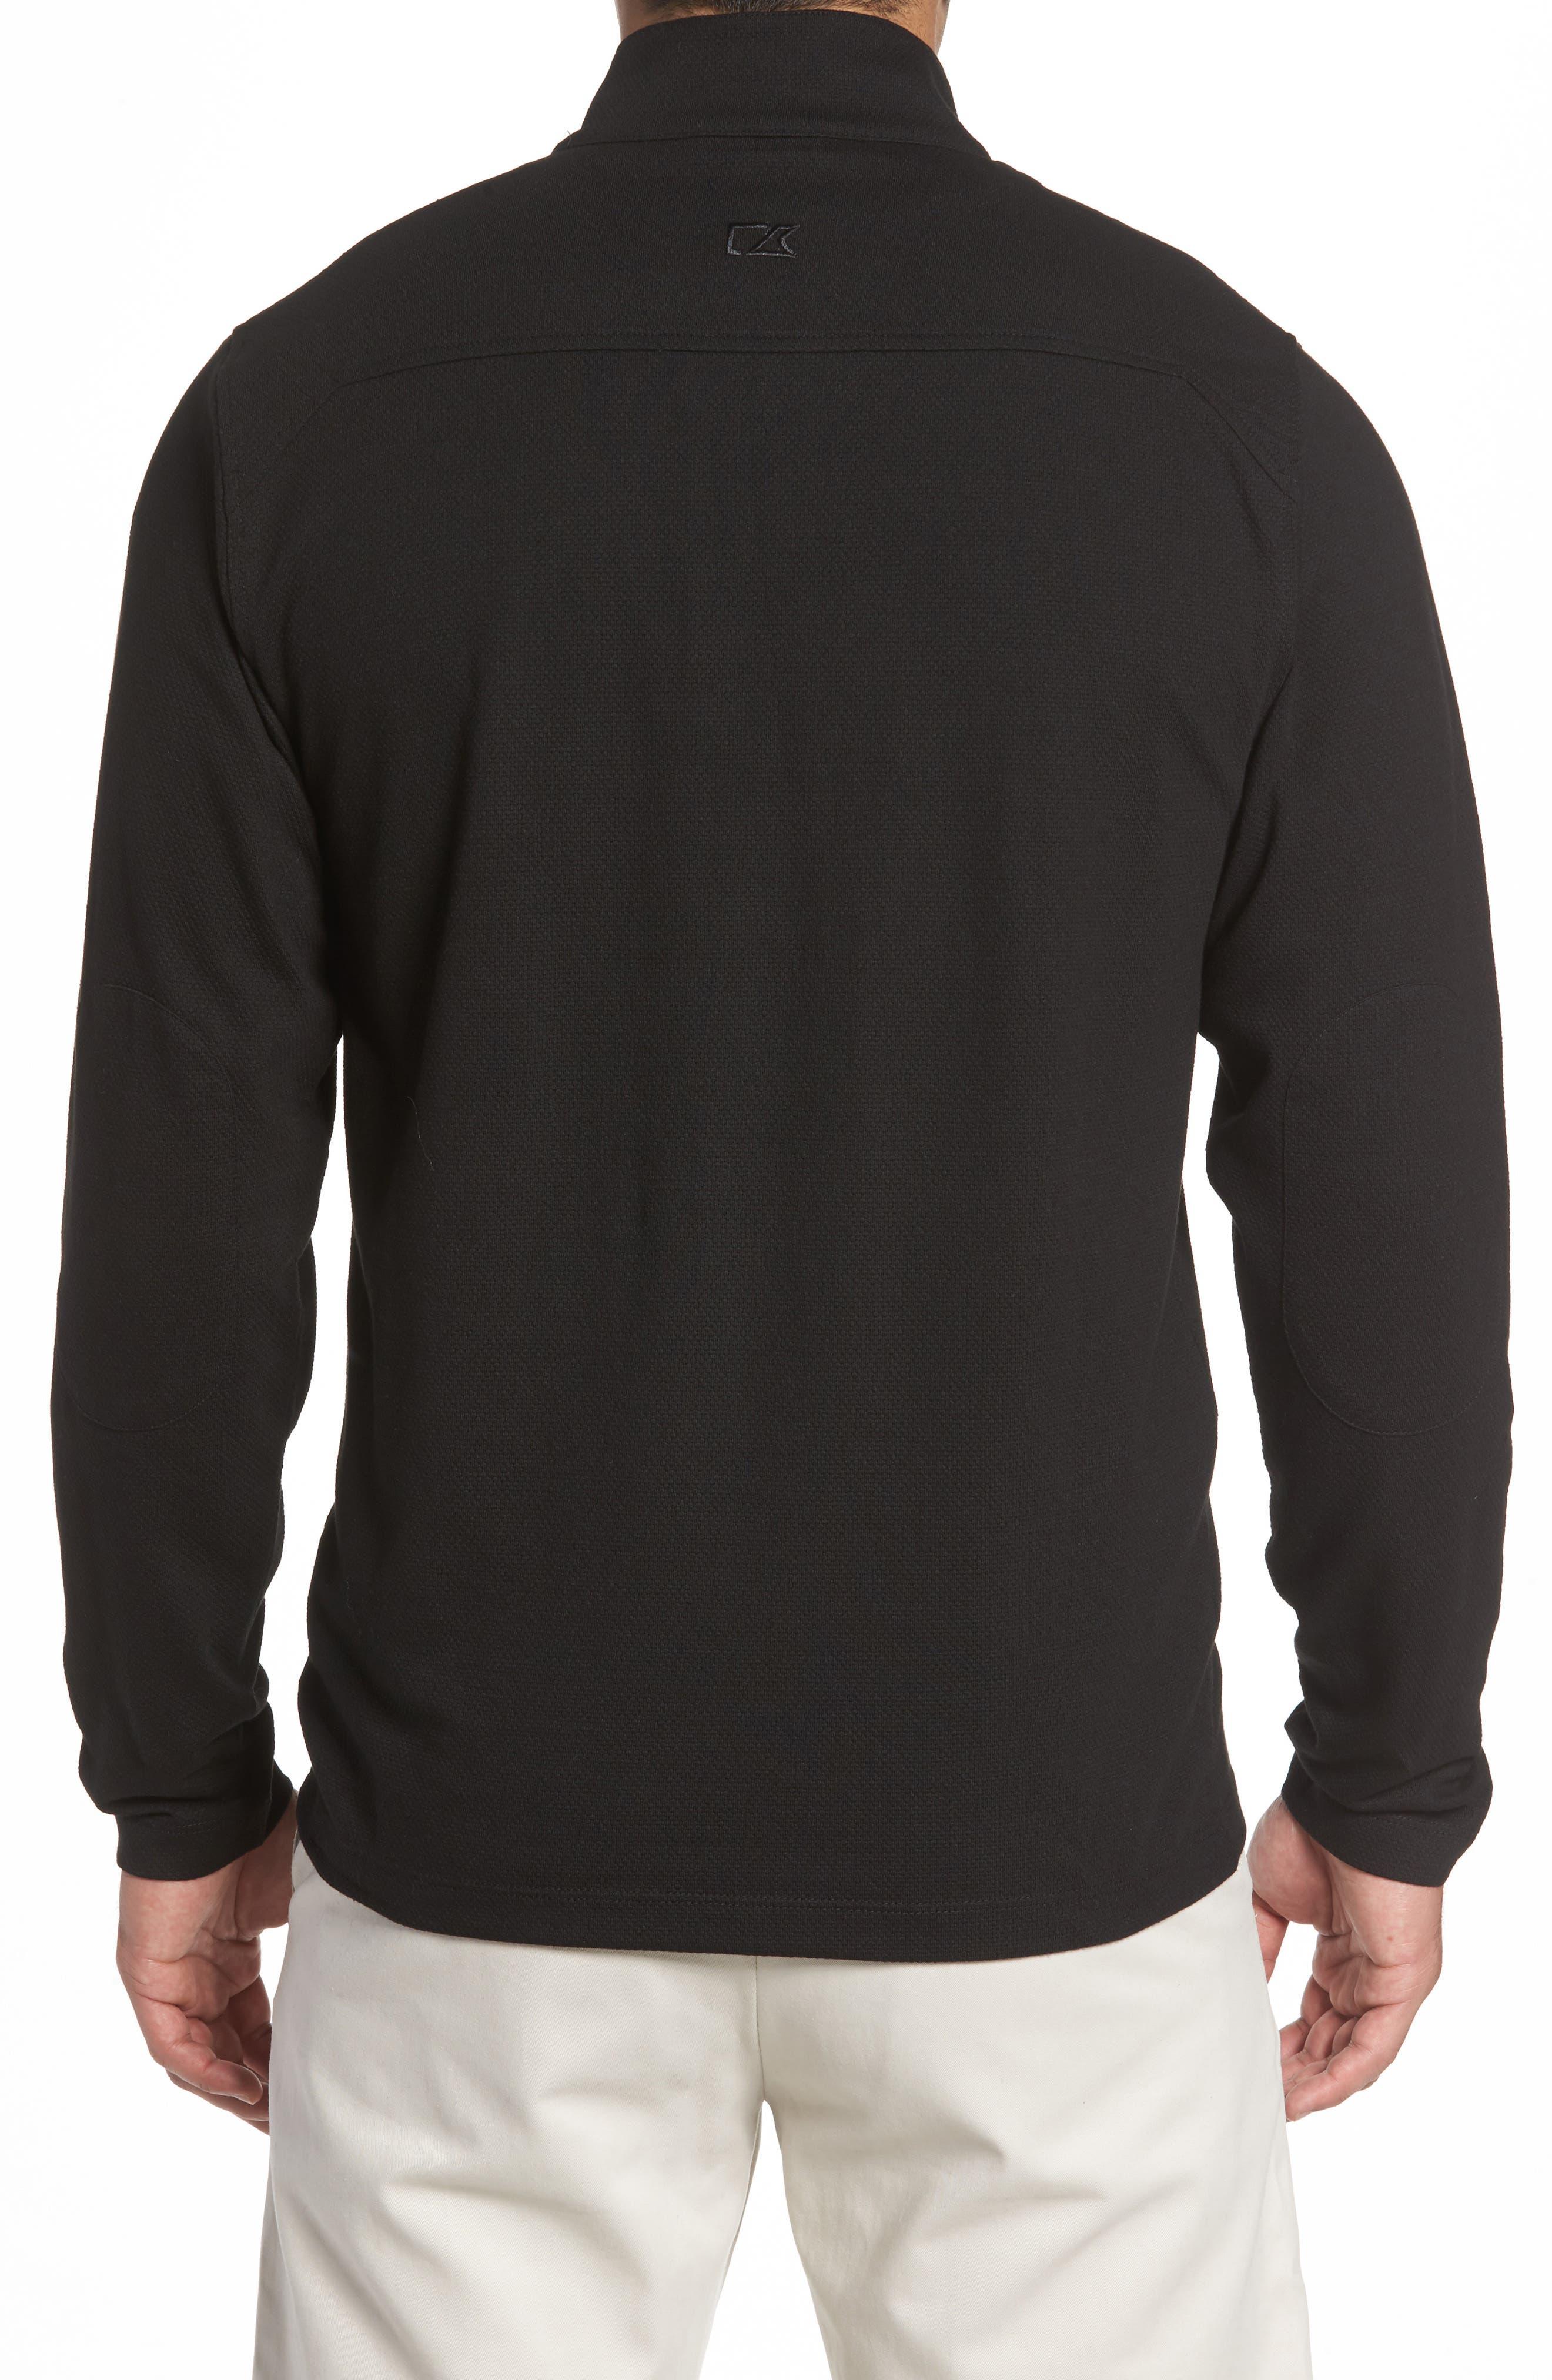 Hewitt Quarter-Zip Waffle Knit Pullover,                             Alternate thumbnail 2, color,                             Black